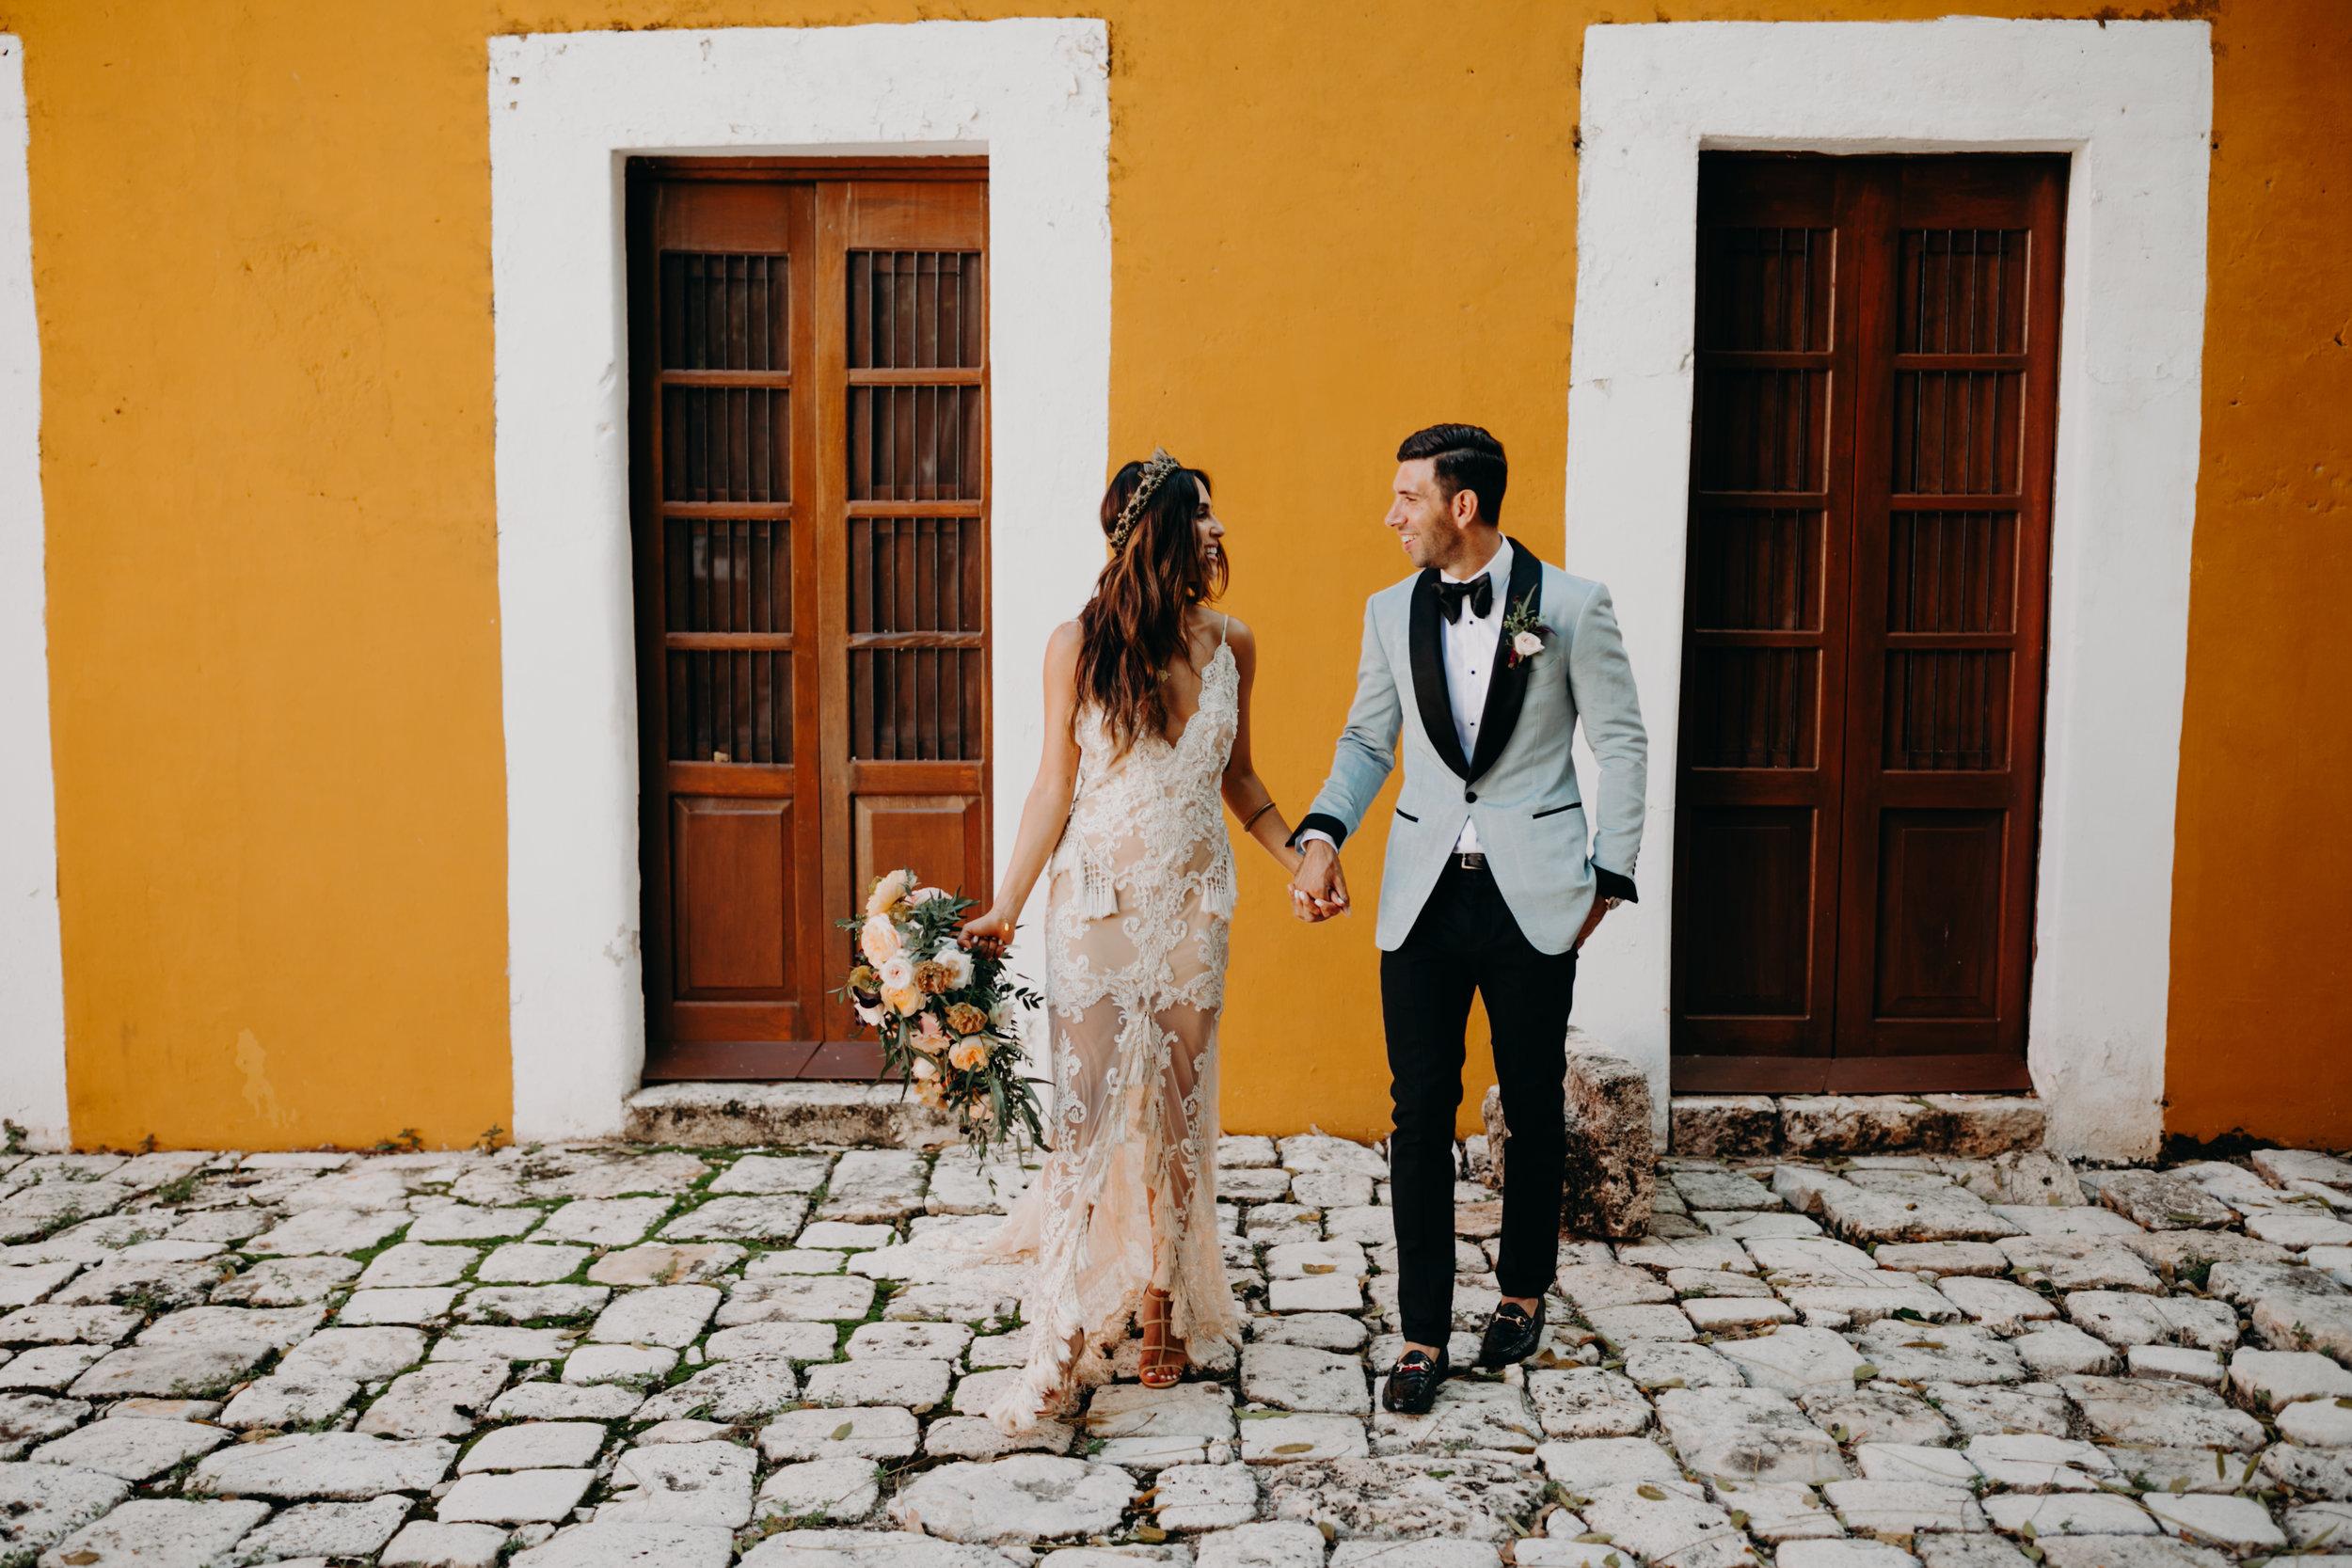 Hacienda Temozon Yucatan Mexico Wedding | Ida & Peter Emily Magers Photography-587.jpg